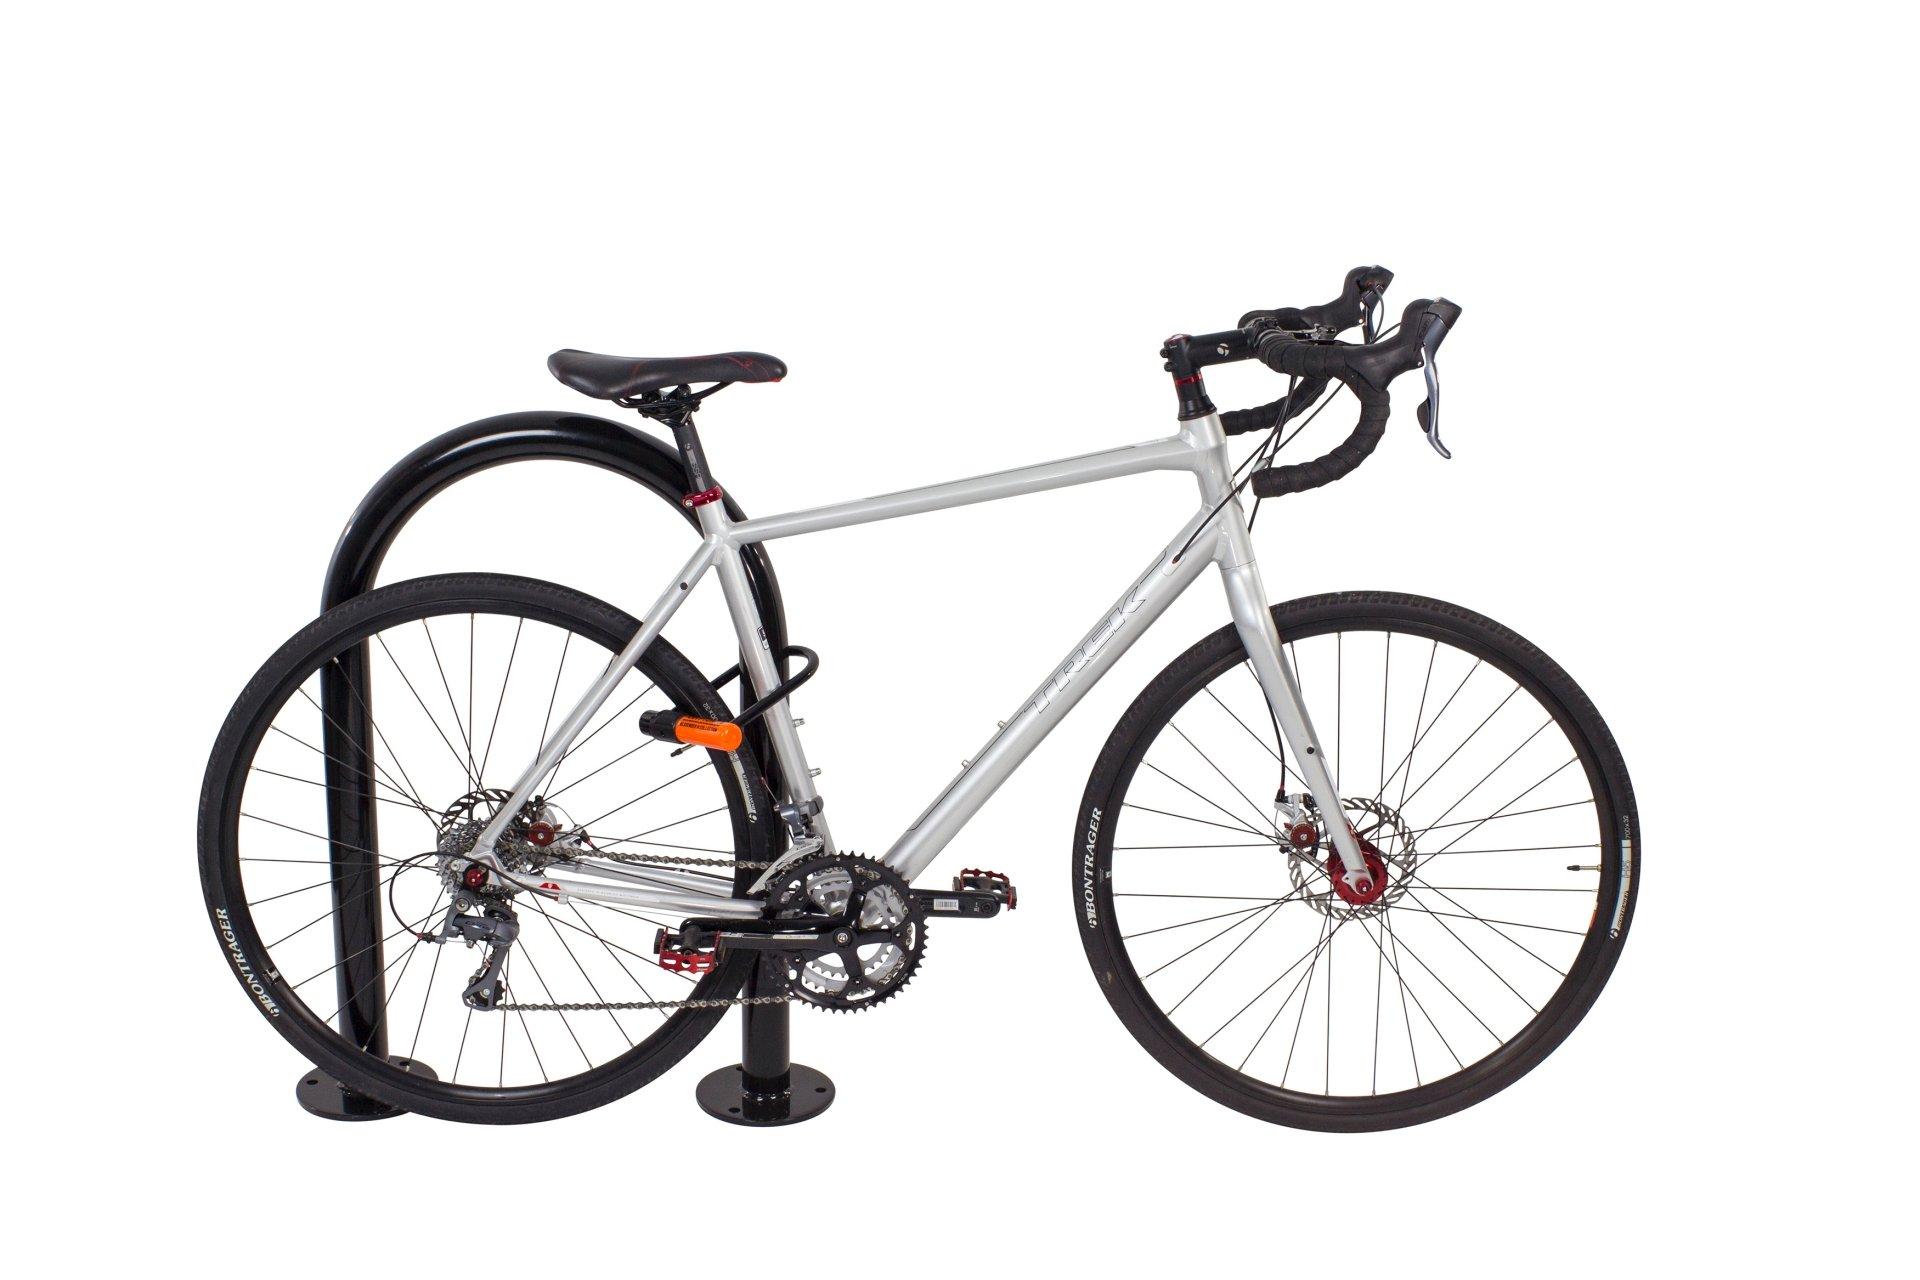 Kryptonite Evolution Mini 7 Bike U Lock /& 4 Foot Cable Sold Secure Silver